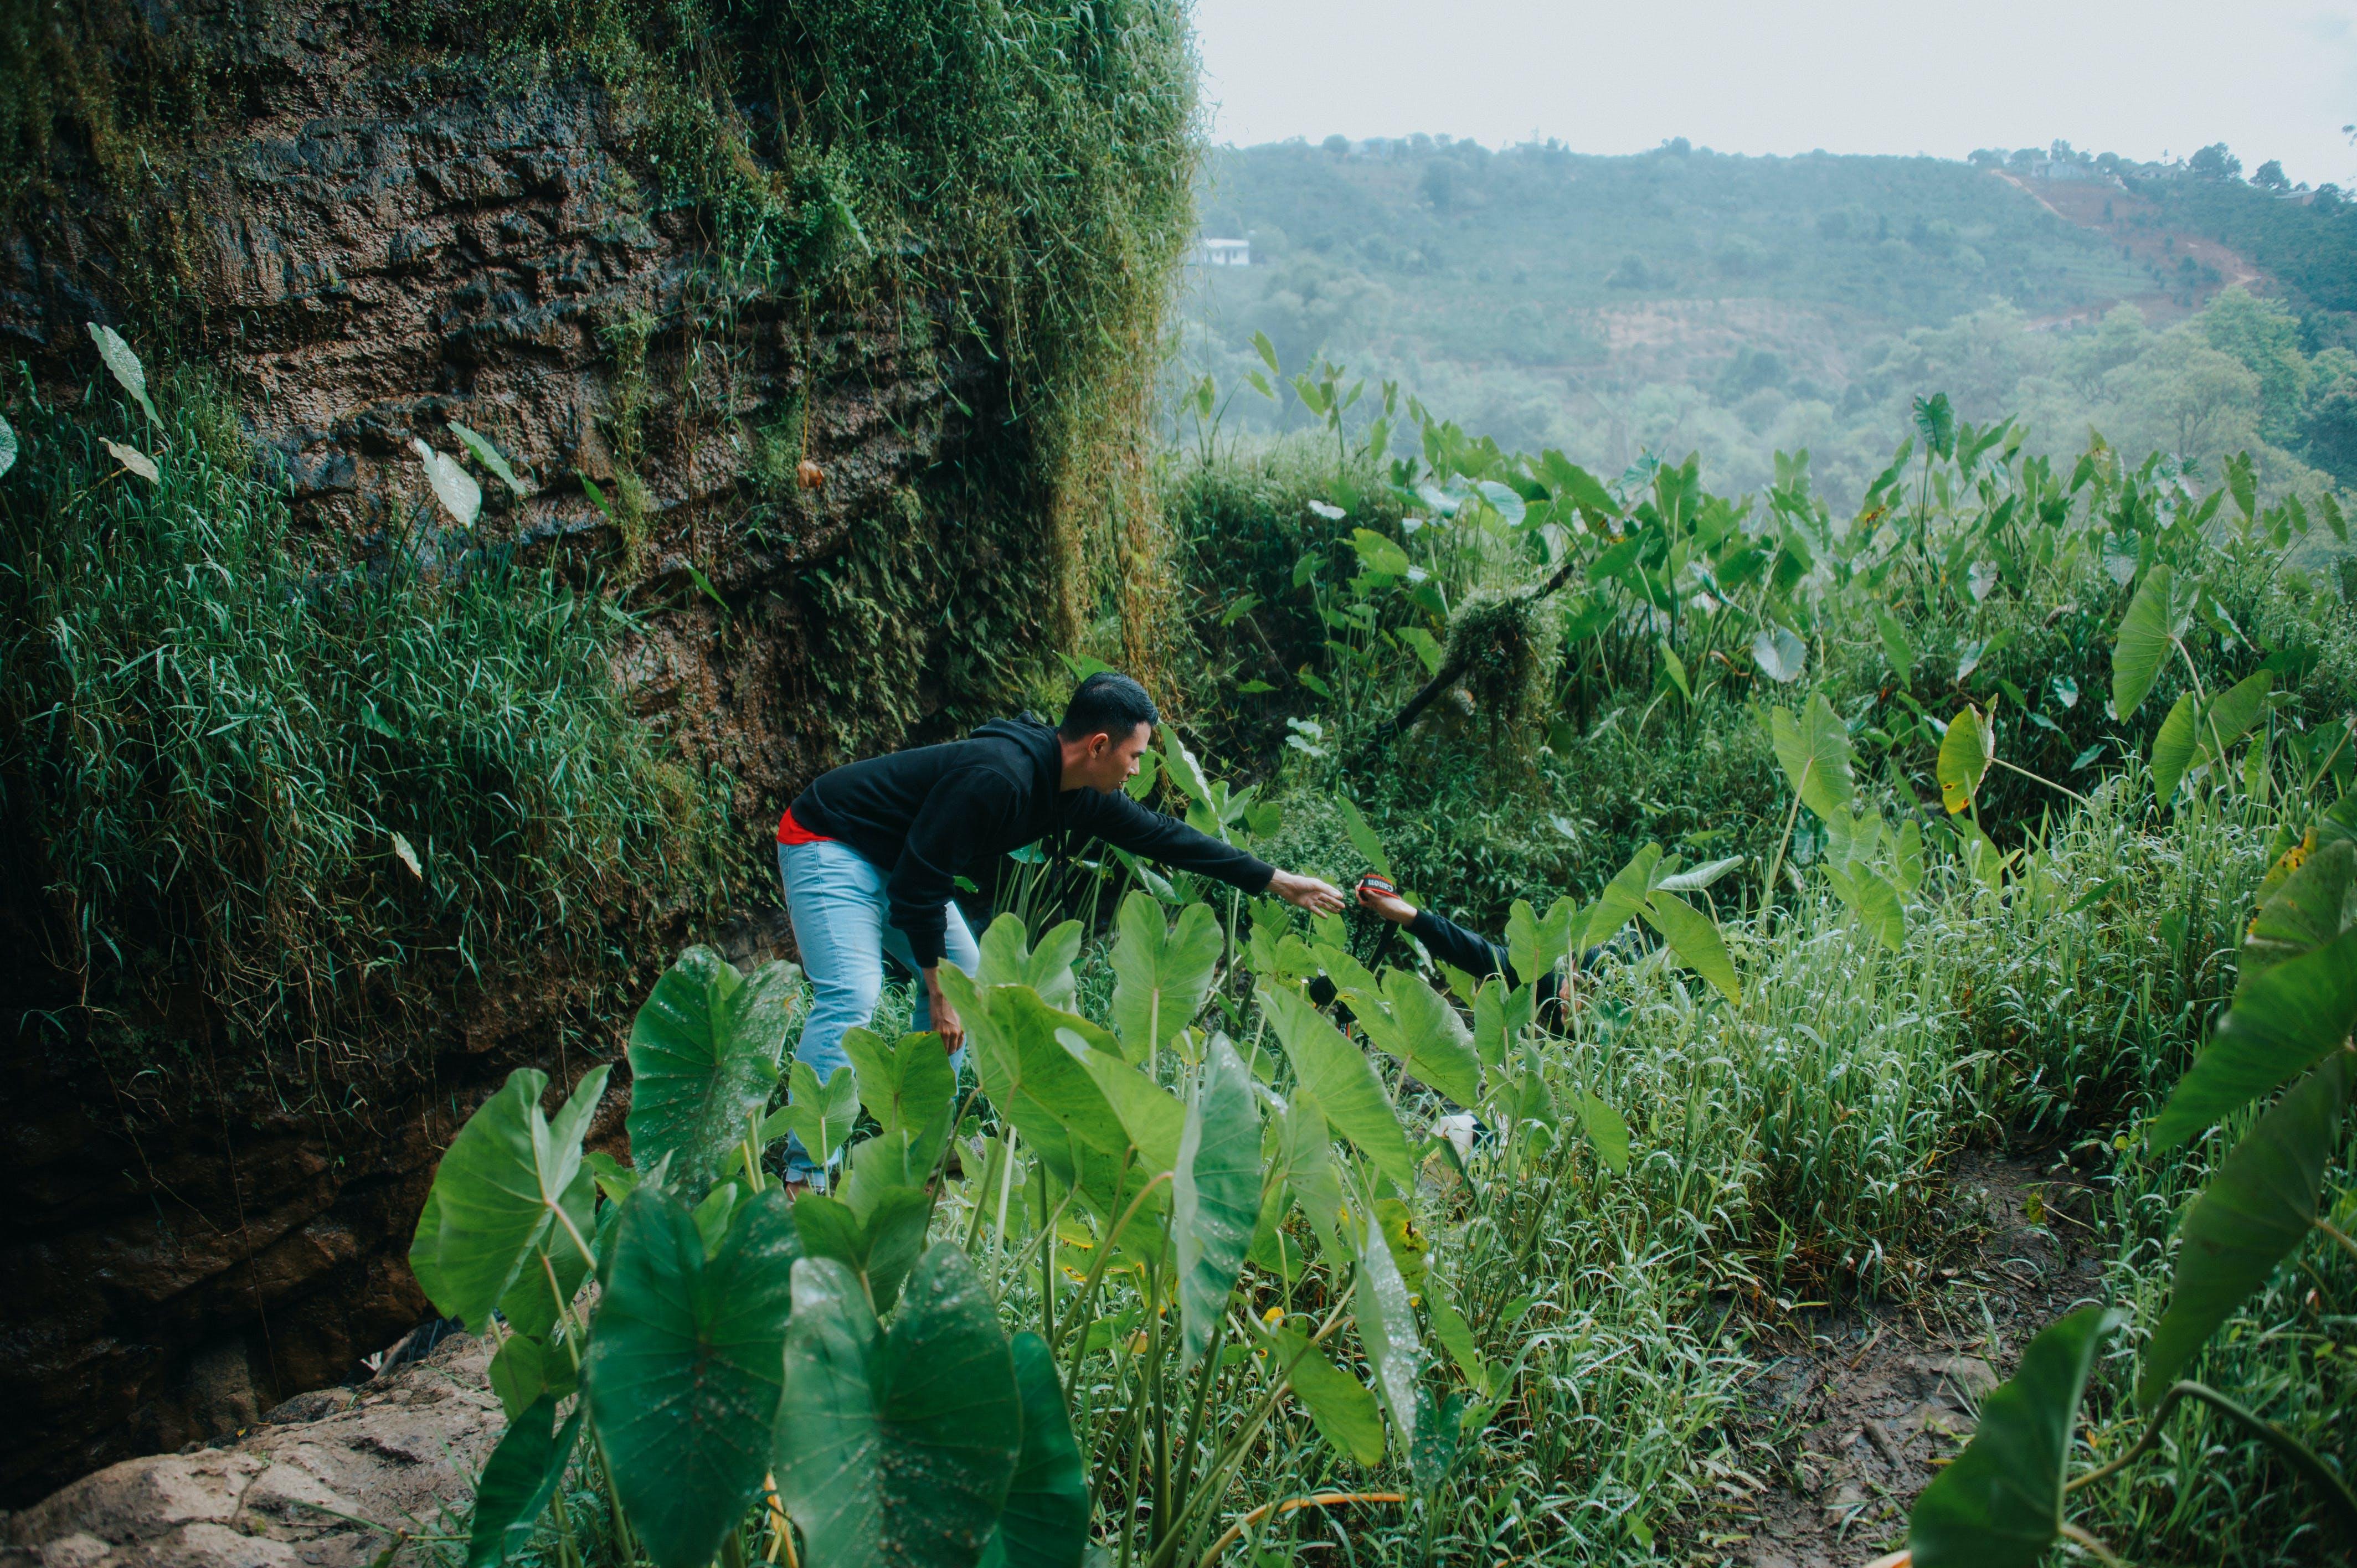 Man Wearing Black Long-sleeved Shirt and Blue Denim Bottoms